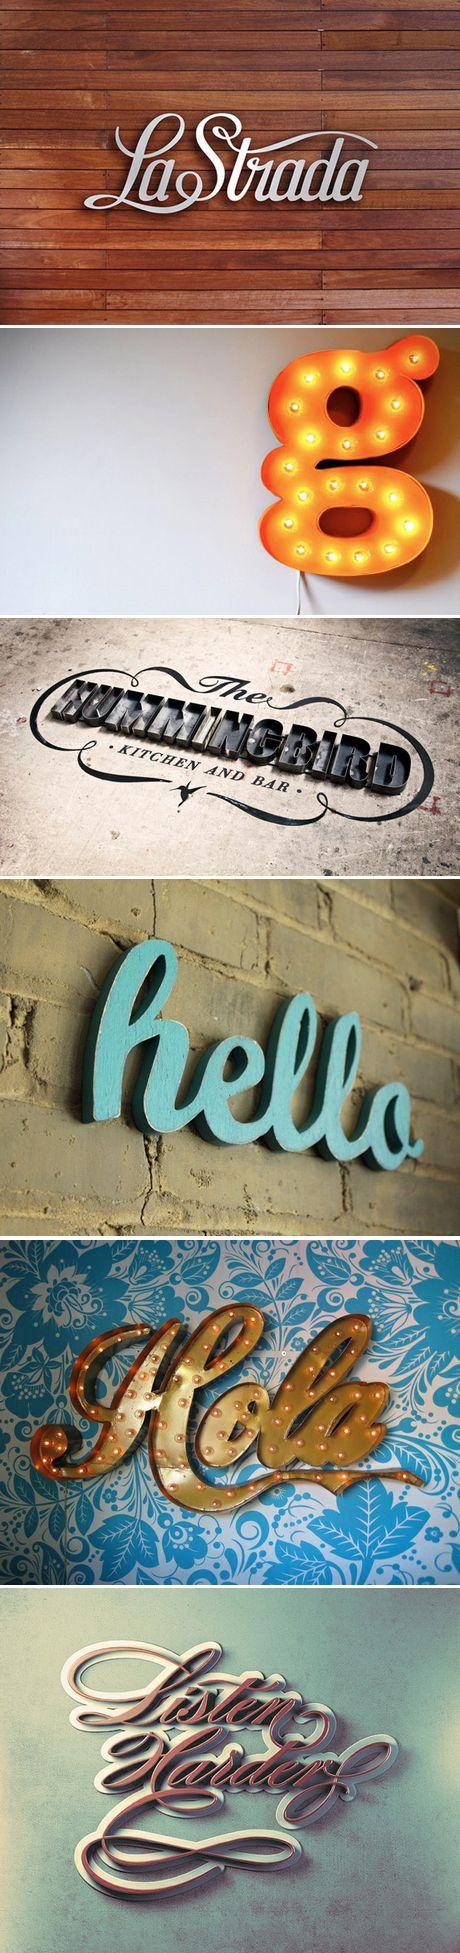 pinterest.com/fra411 #typographic - Some random metal letters